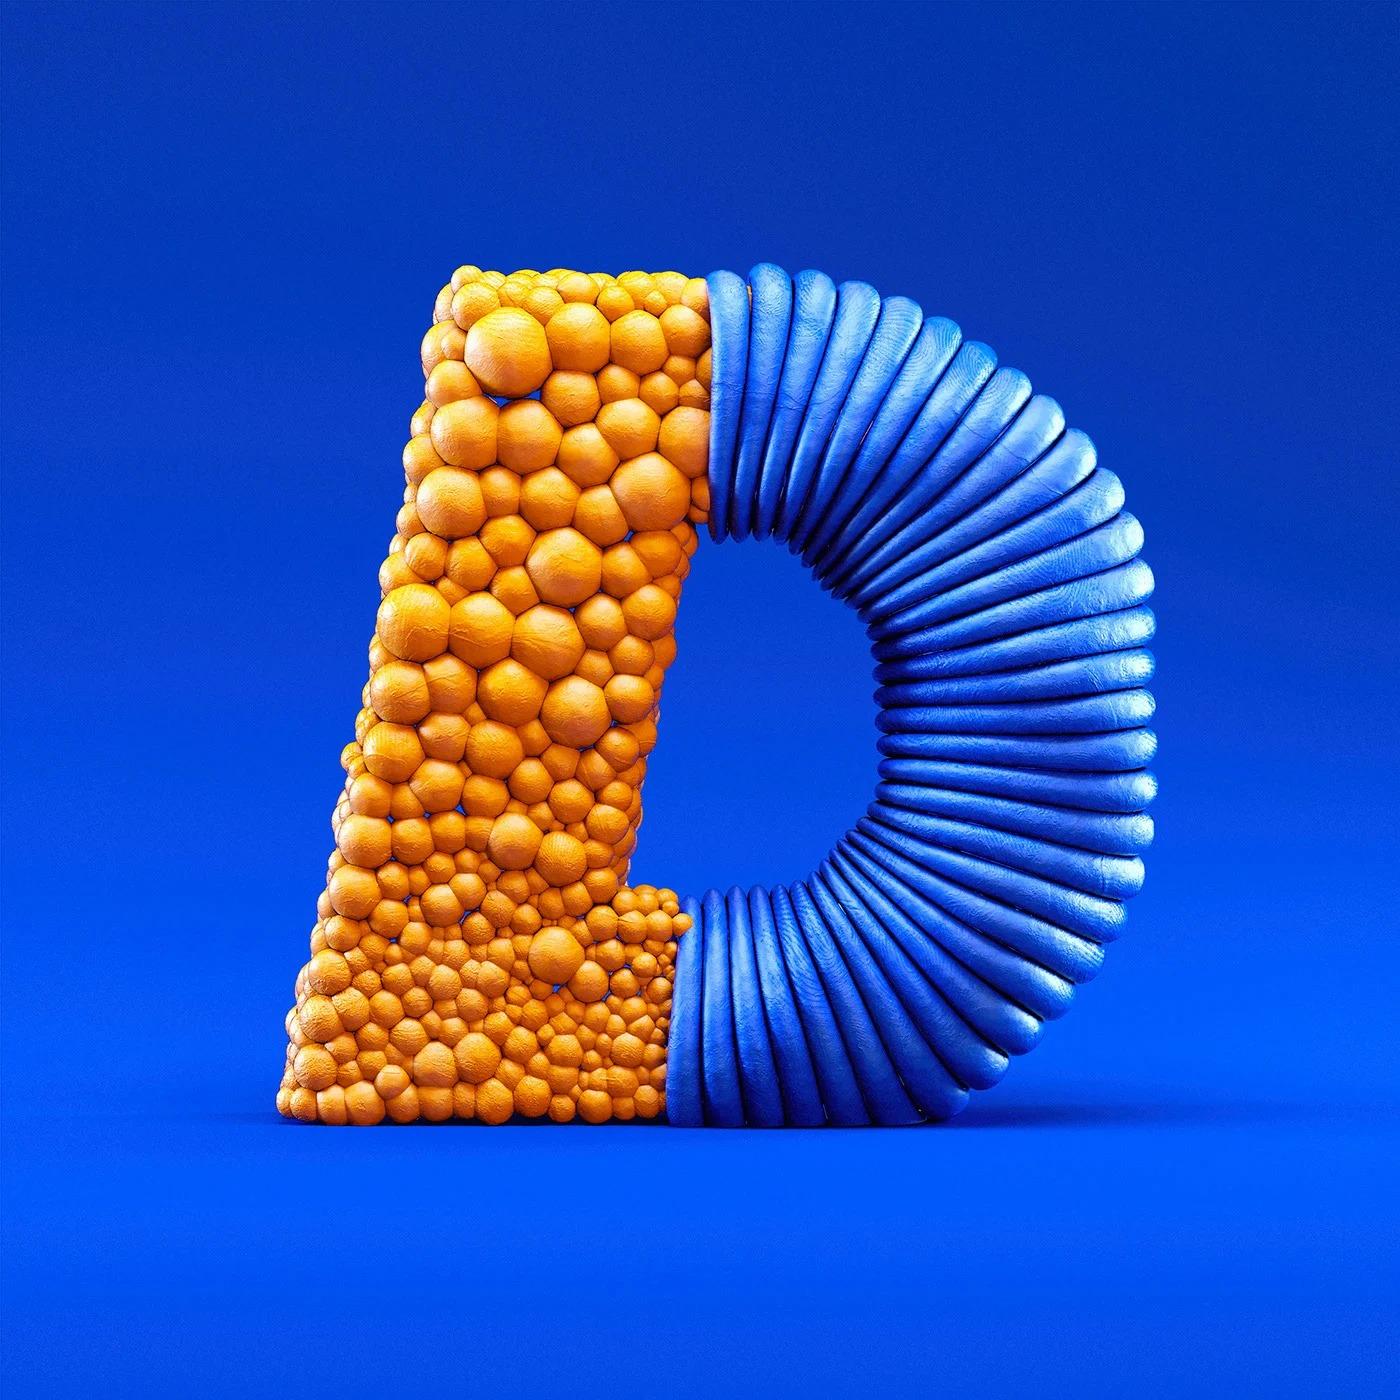 36 Days of Type: Raffaele Micillo创意字母设计